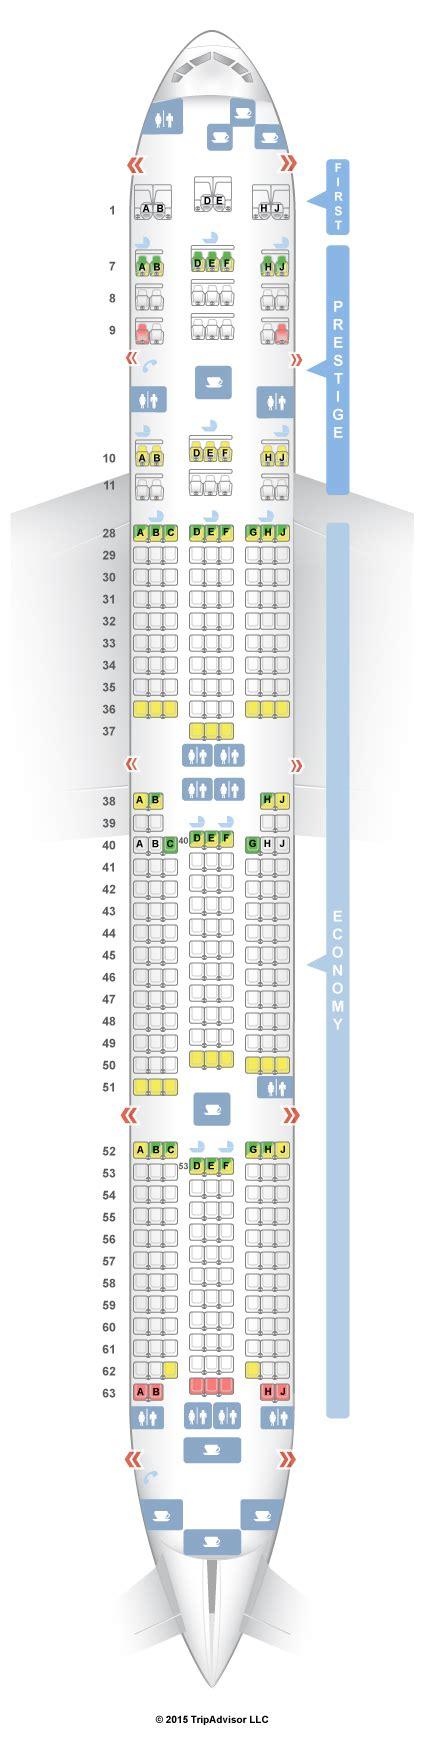 korean air seat seatguru seat map korean air boeing 777 300 773